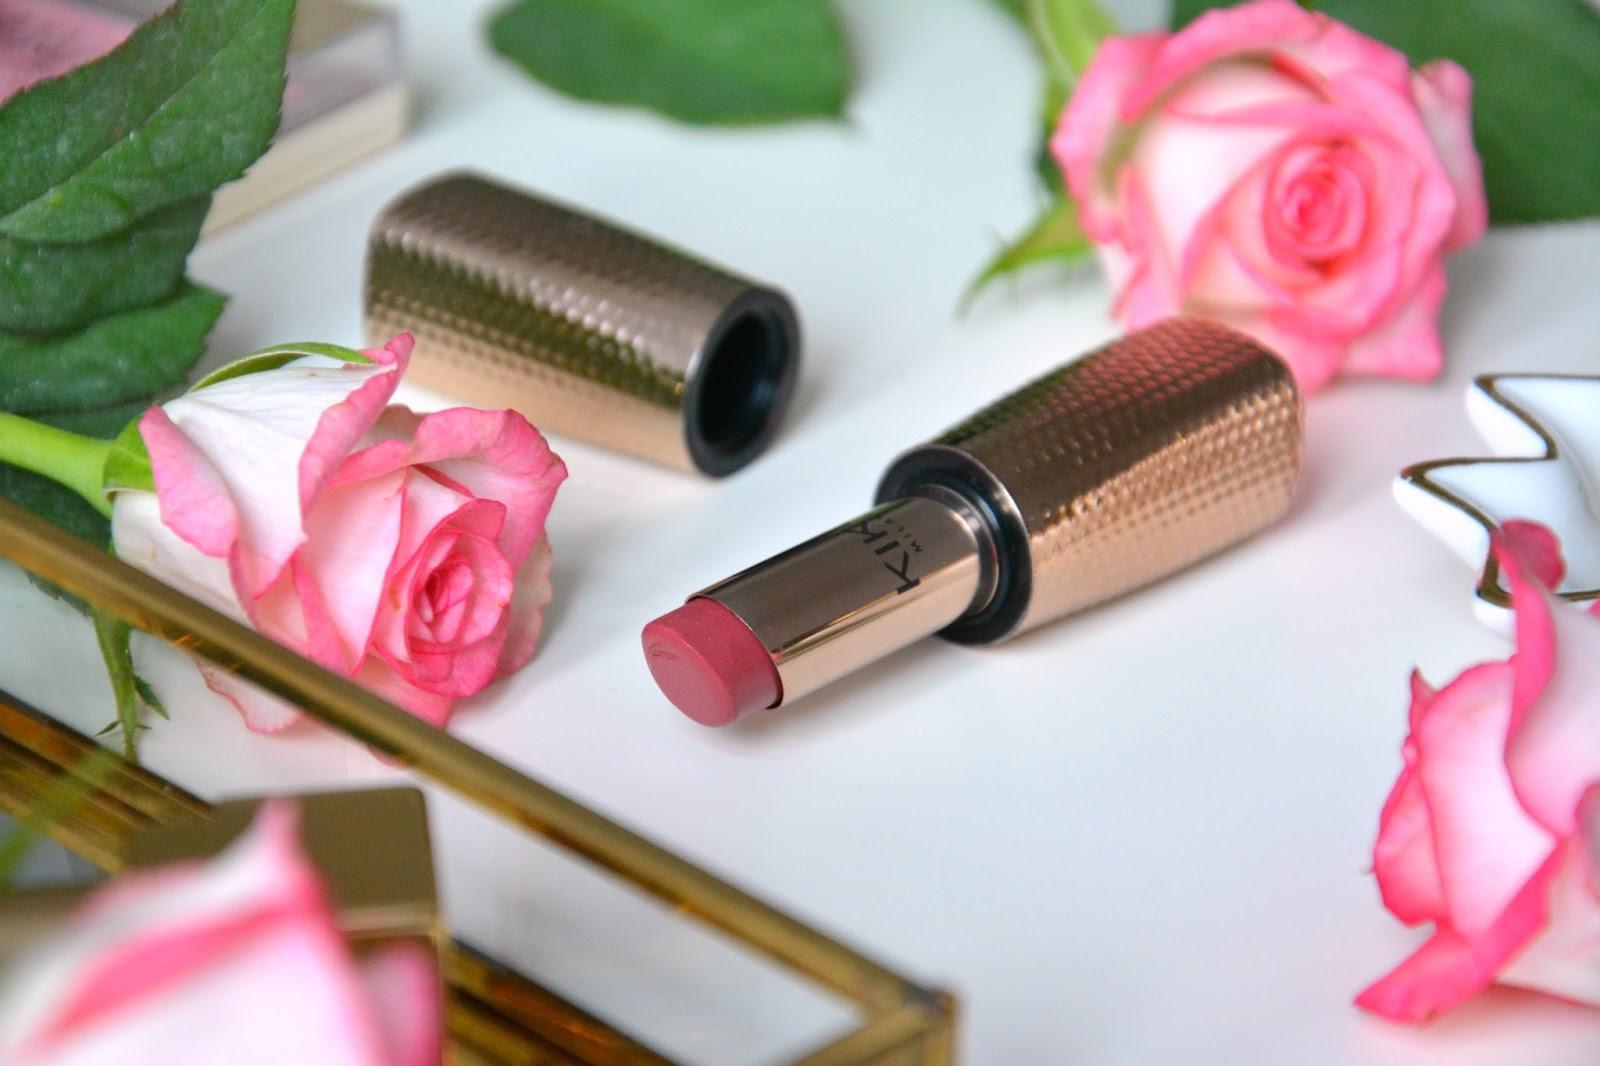 Kiko Lipstick; Fresh Pink Roses